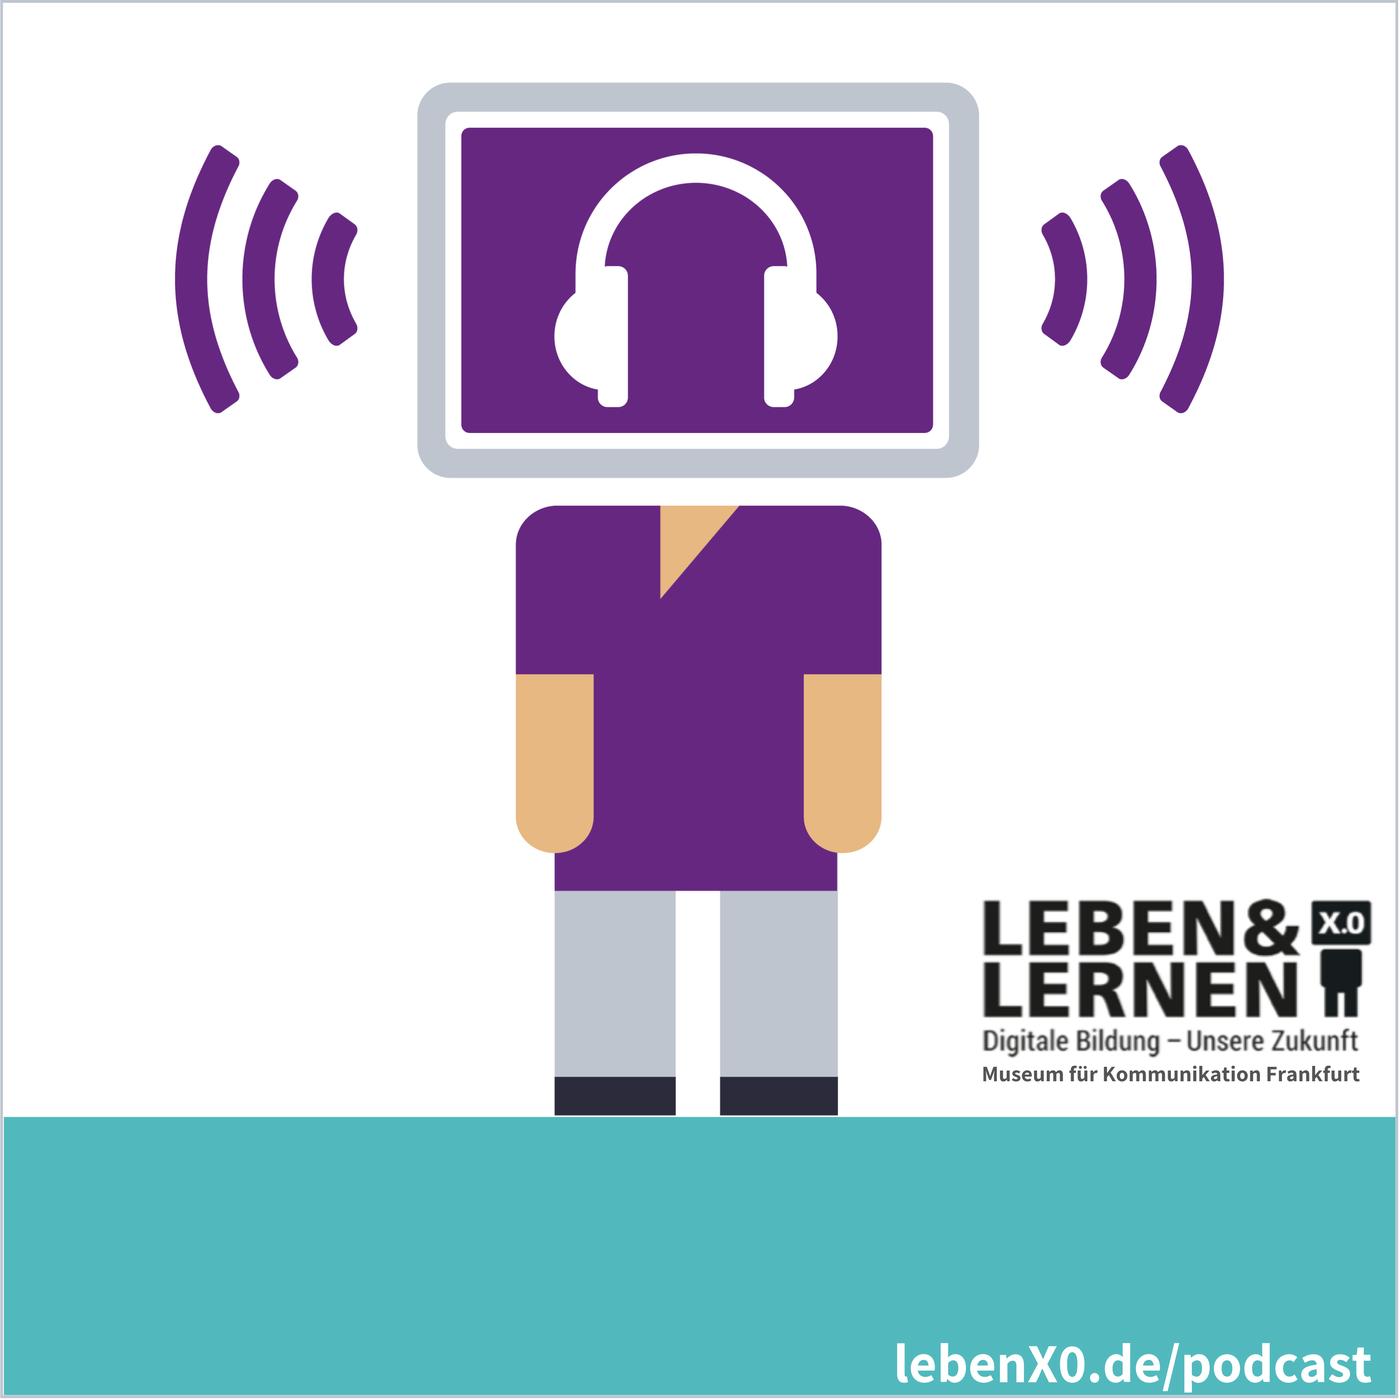 Leben X.0 - Der Erklärpodcast zum Digitalen Wandel